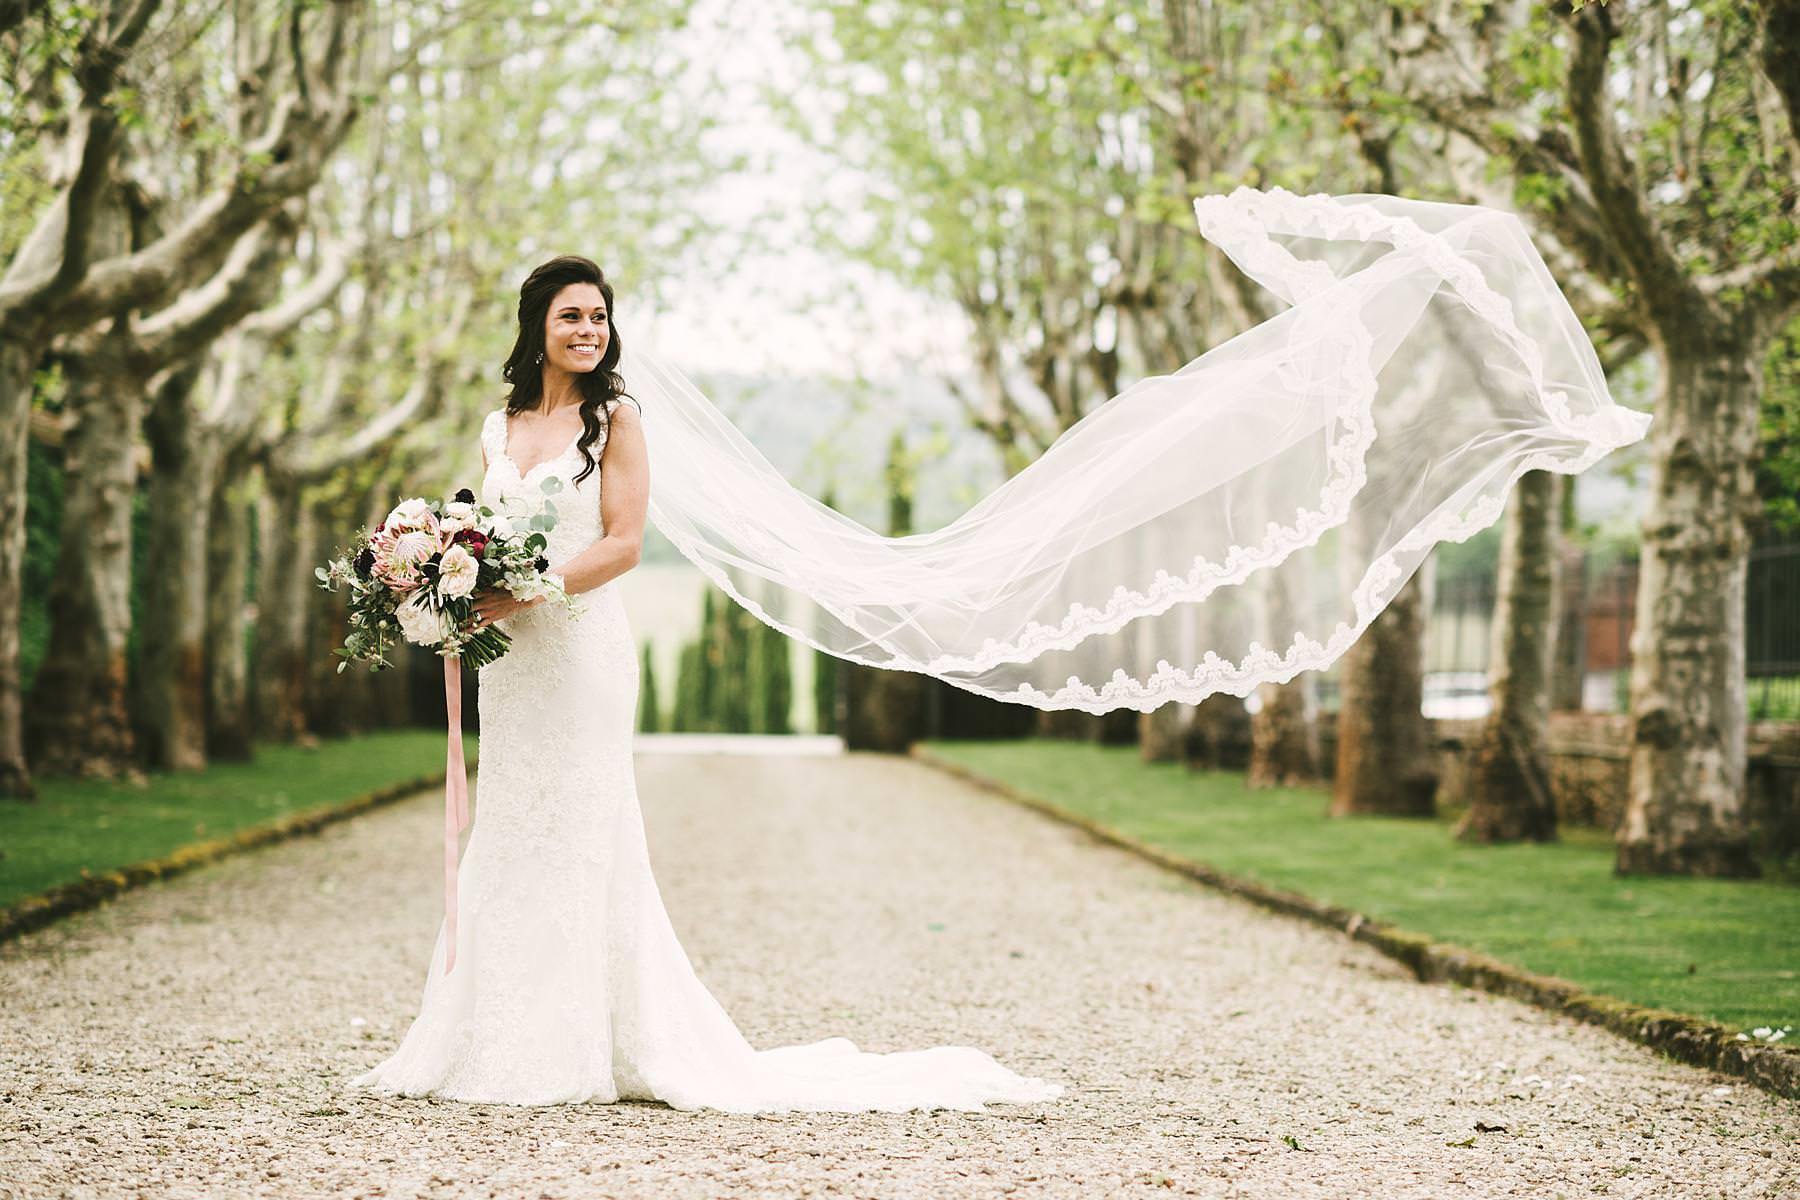 Elegant bride Juliana in Pronovias wedding gown at historic estate of Villa La Selva Wine Resort. Destination wedding in Italy